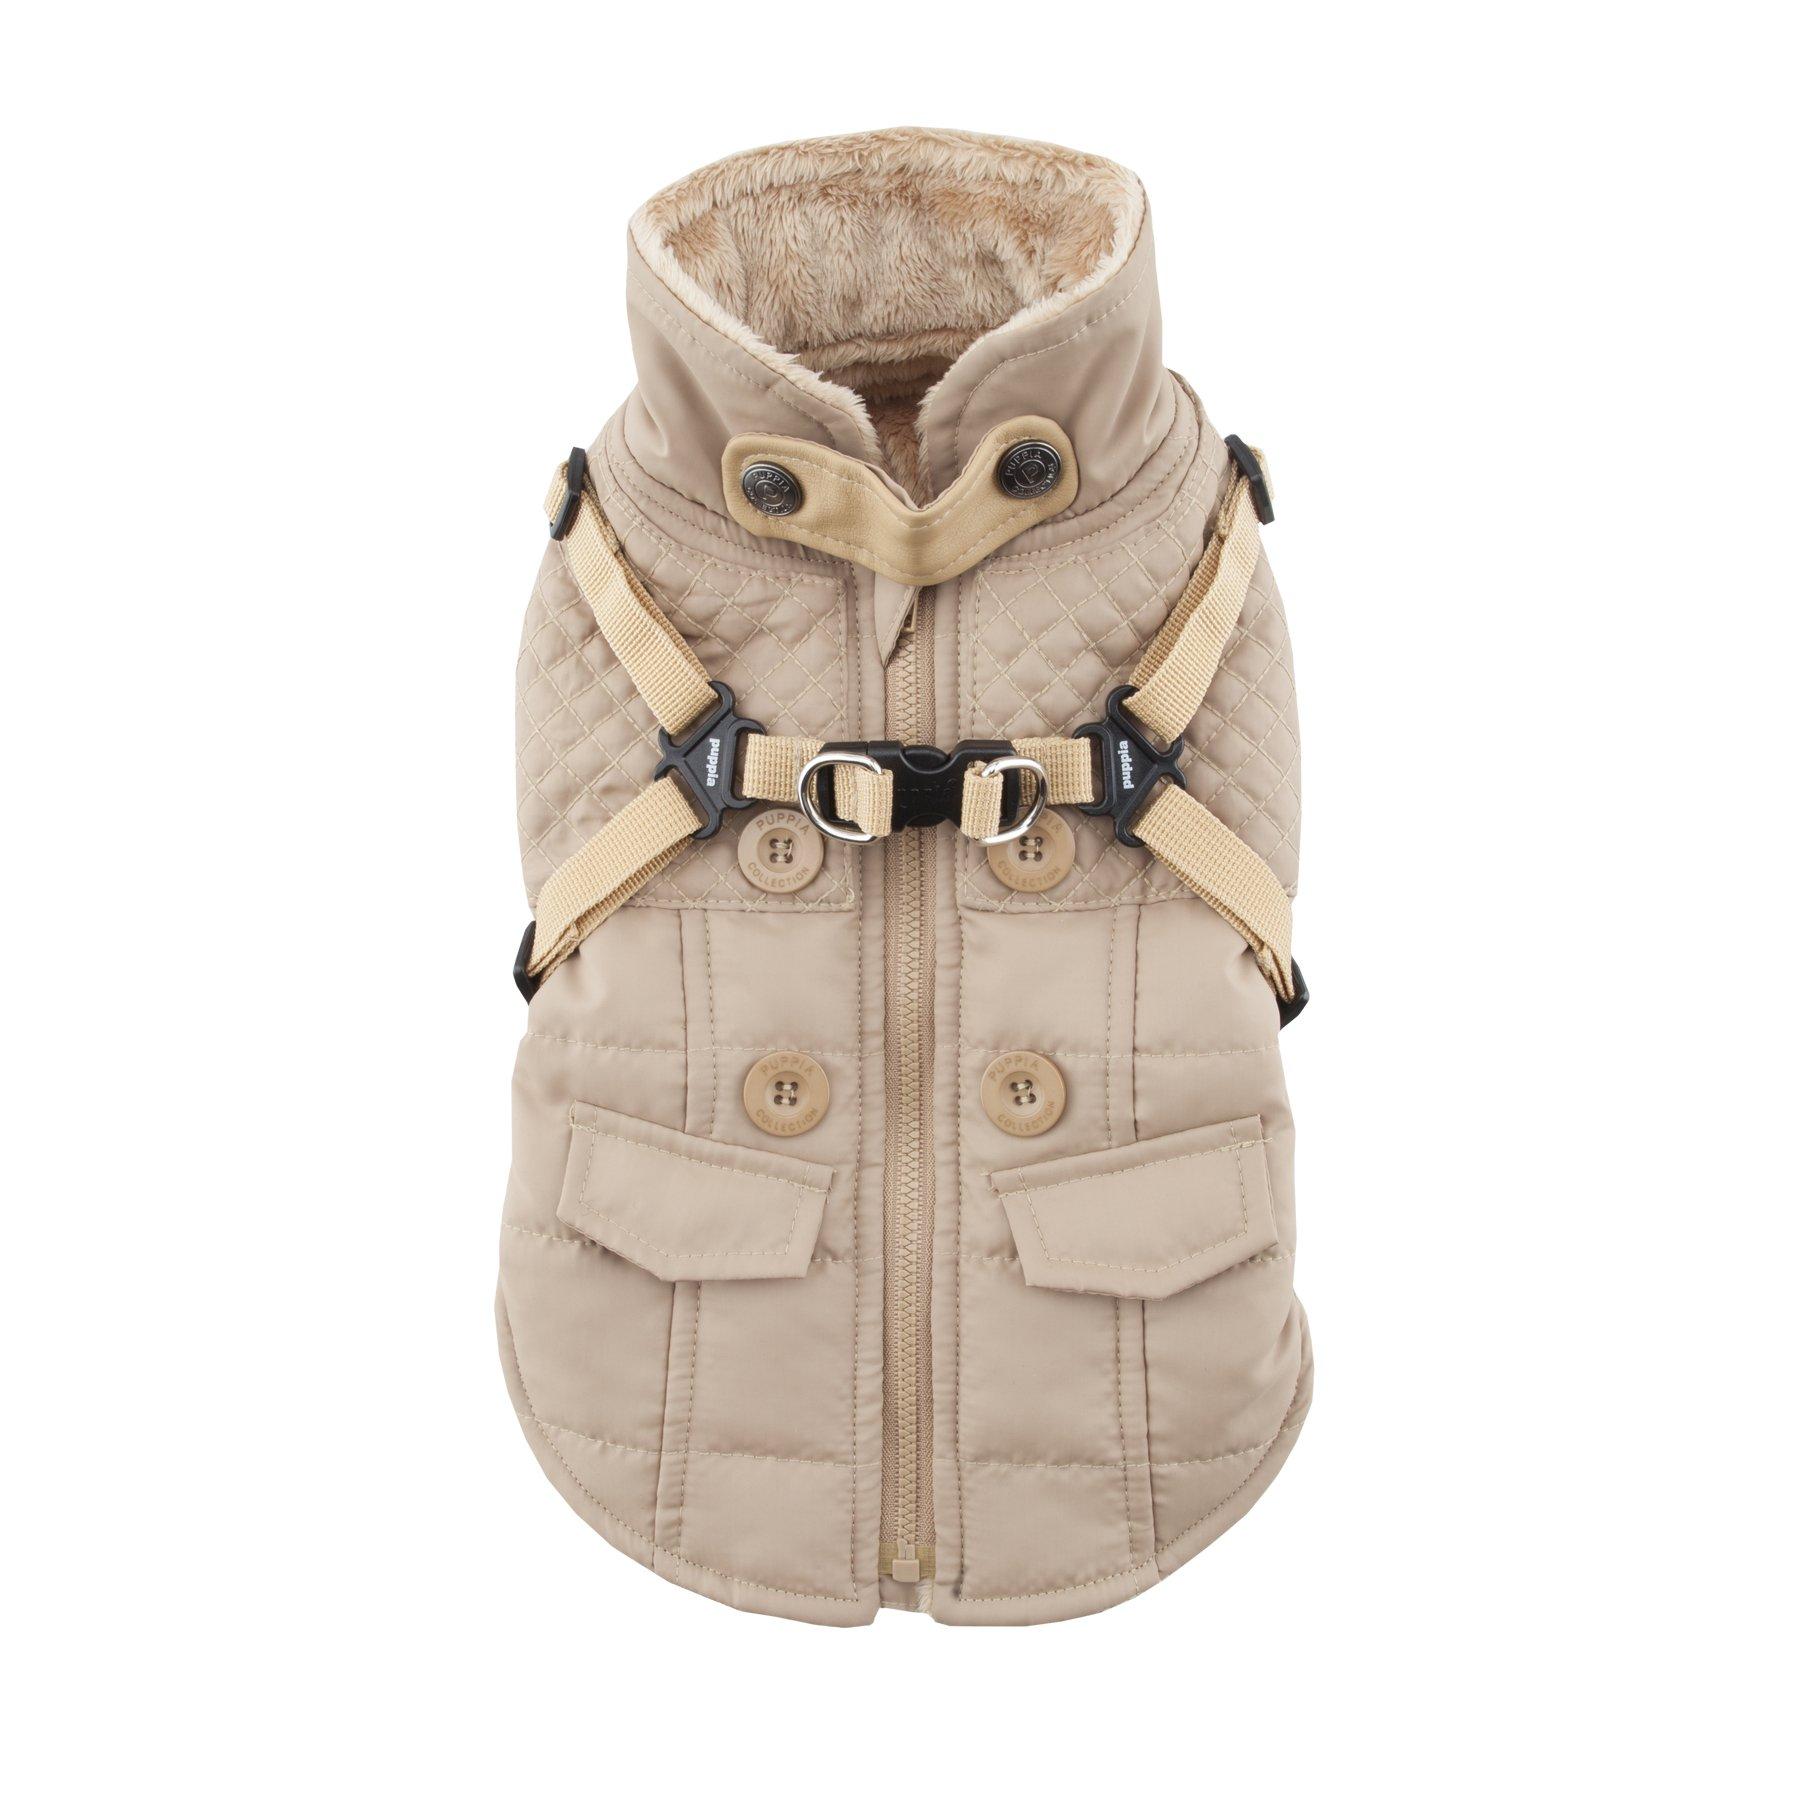 Puppia Wilkes Winter Fleece Vest, Large, Beige by Puppia